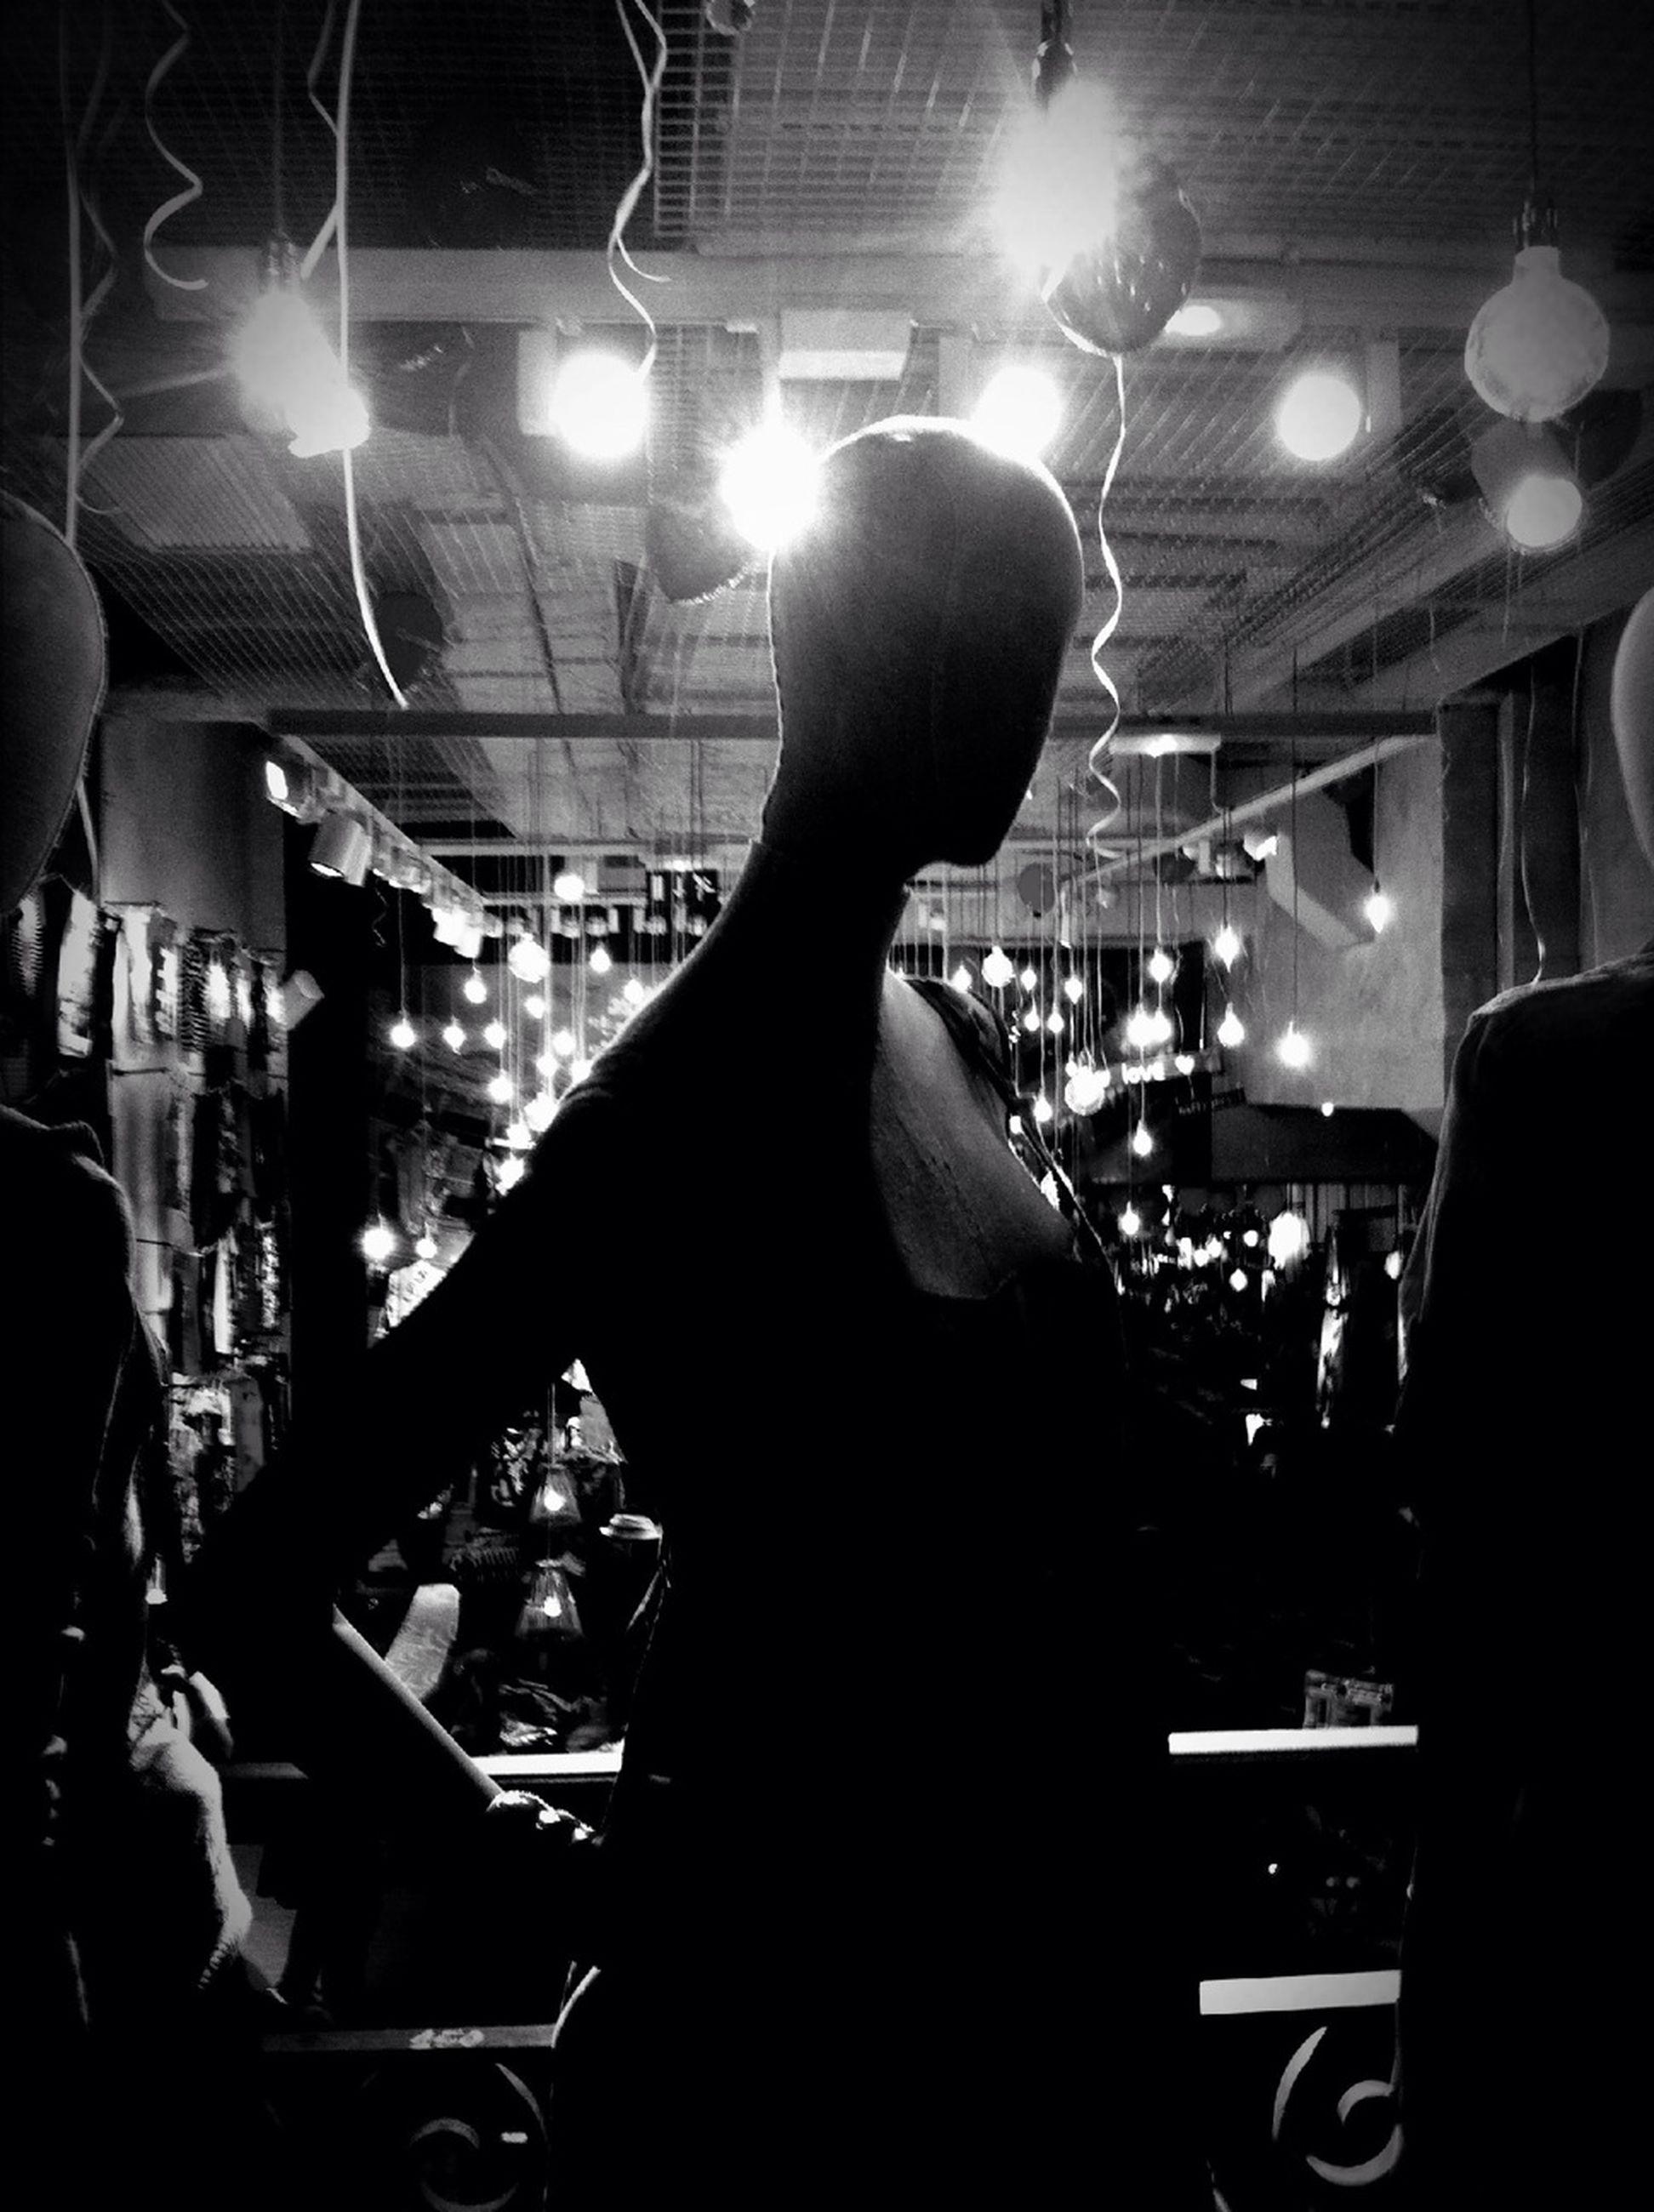 illuminated, indoors, night, lifestyles, men, lighting equipment, leisure activity, nightlife, music, person, arts culture and entertainment, light - natural phenomenon, performance, rear view, standing, light, nightclub